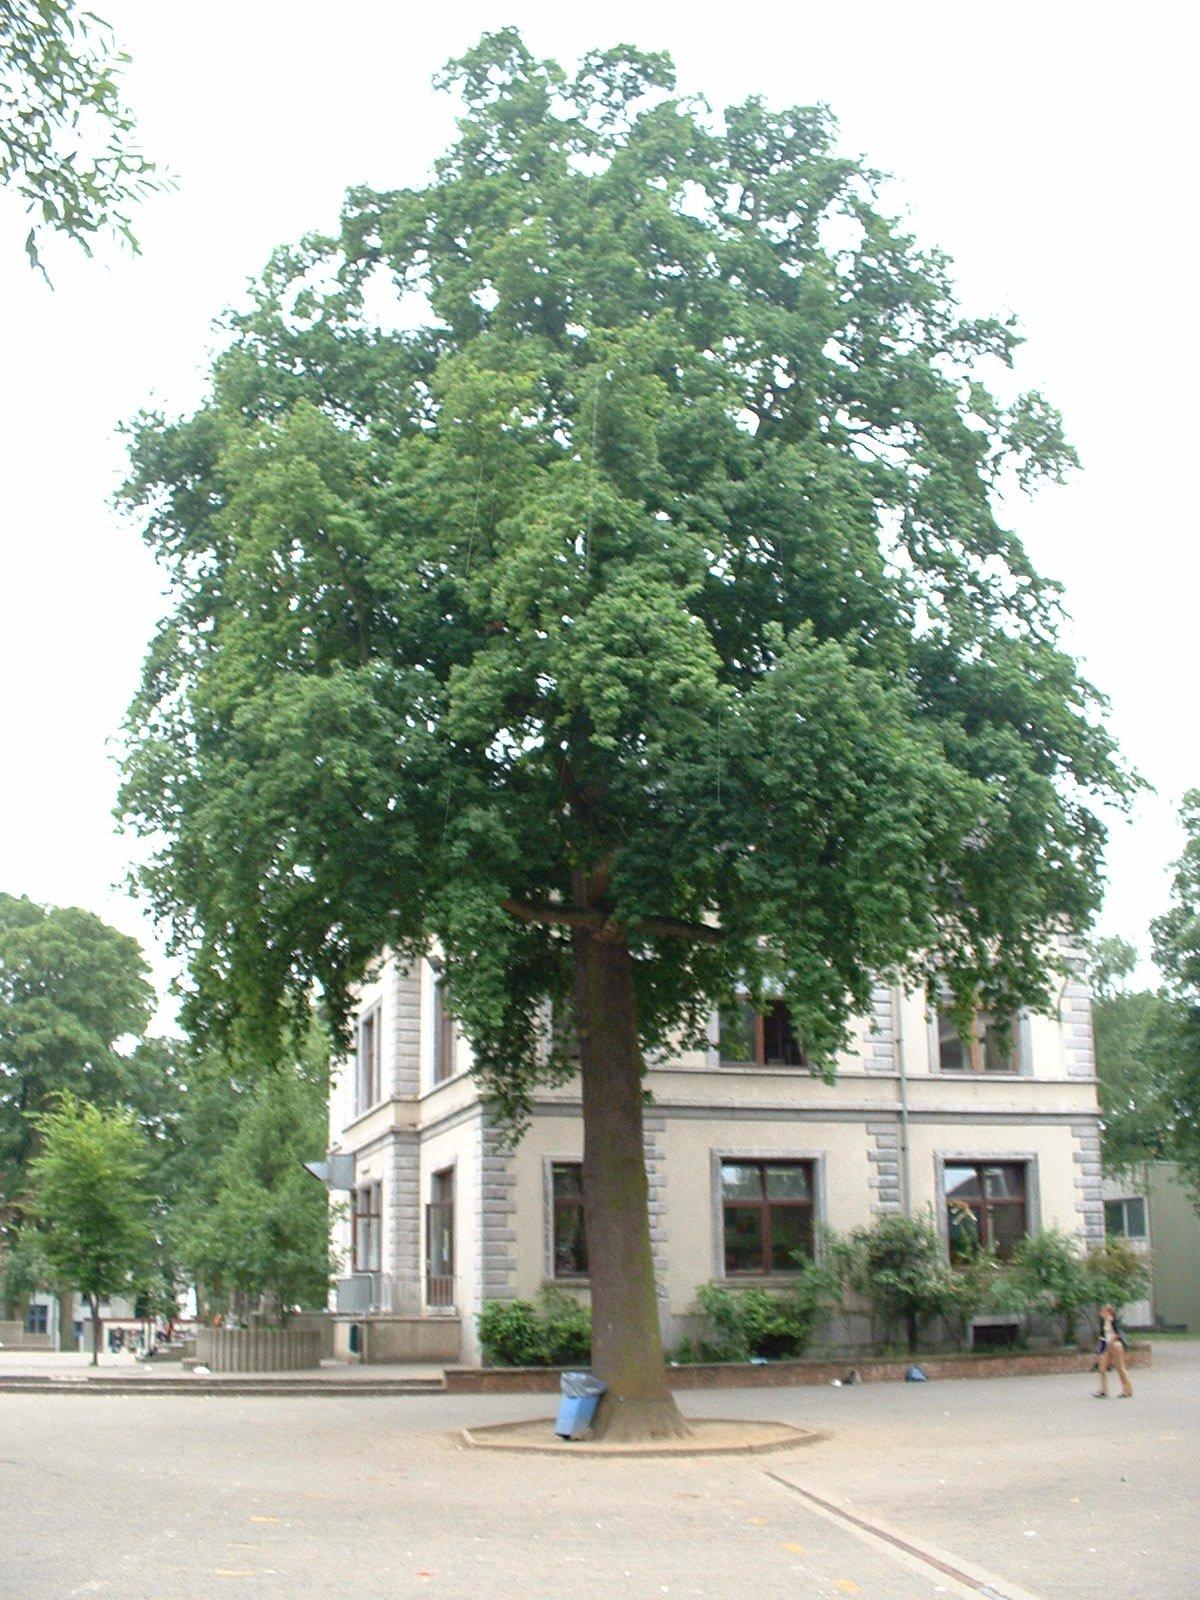 Chêne pédonculé – Etterbeek, Avenue Edmond Mesens, 2 –  03 Juin 2003